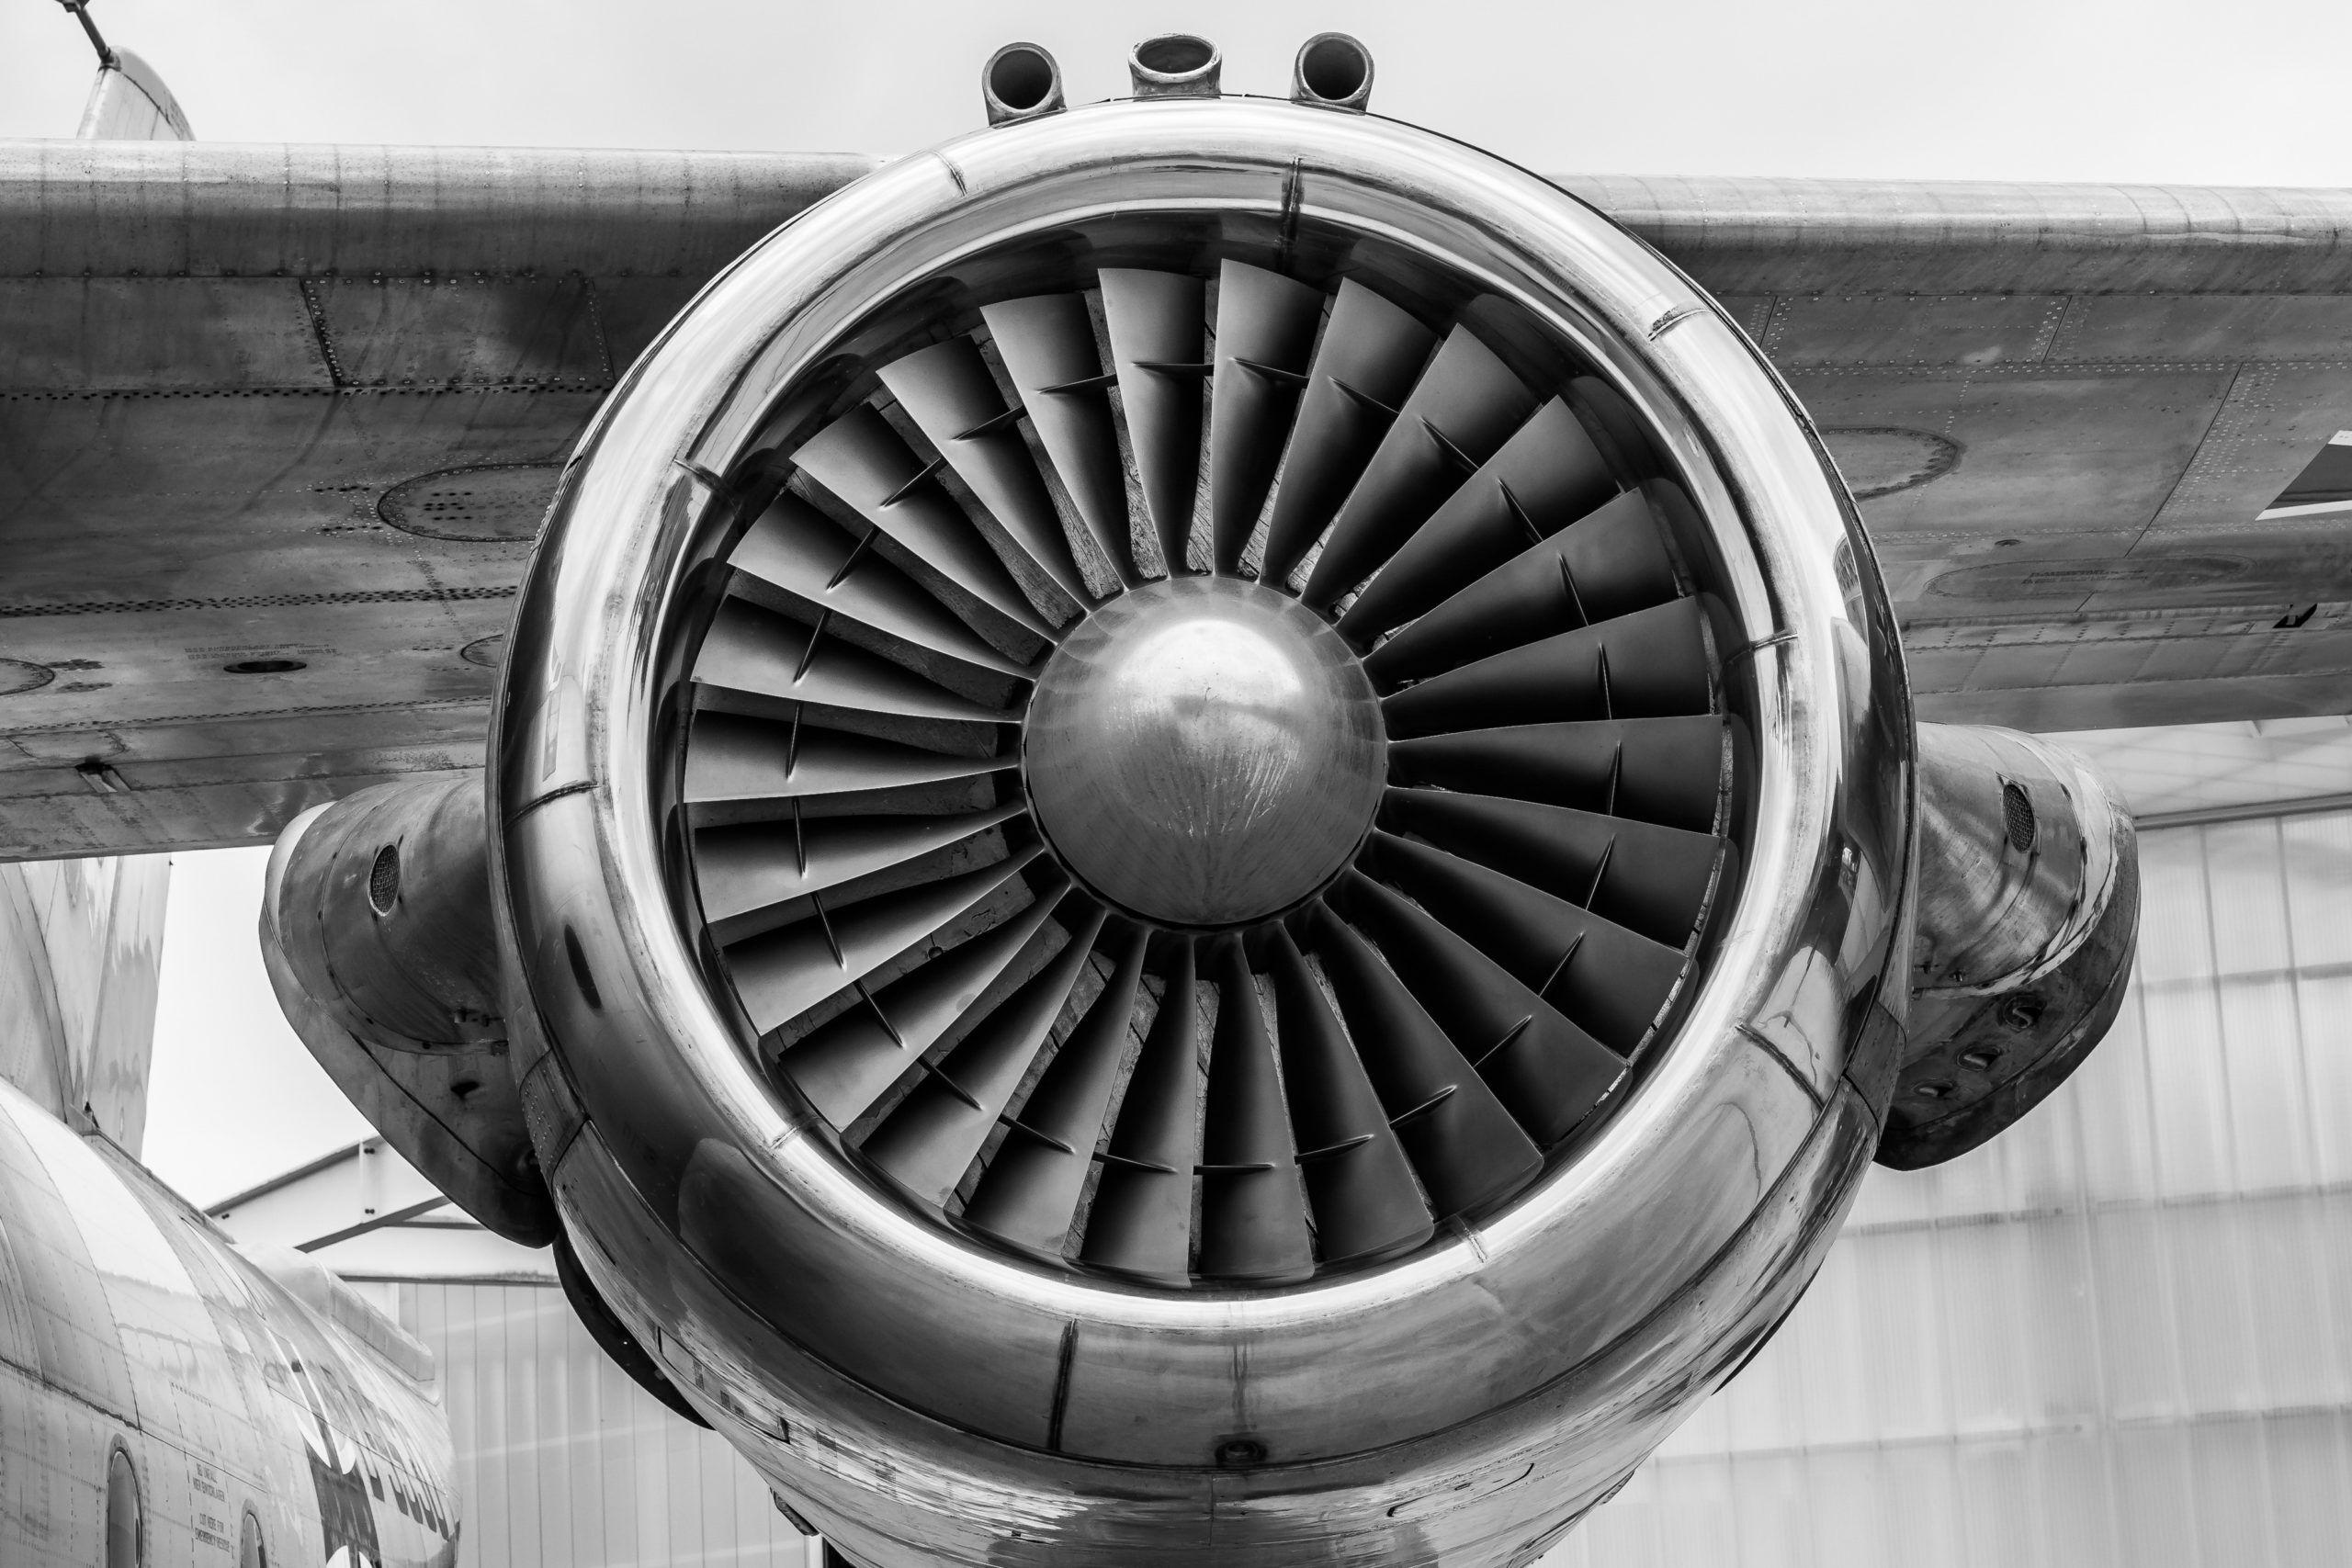 Commerical Airplane Engine - Aerospace Industry Image